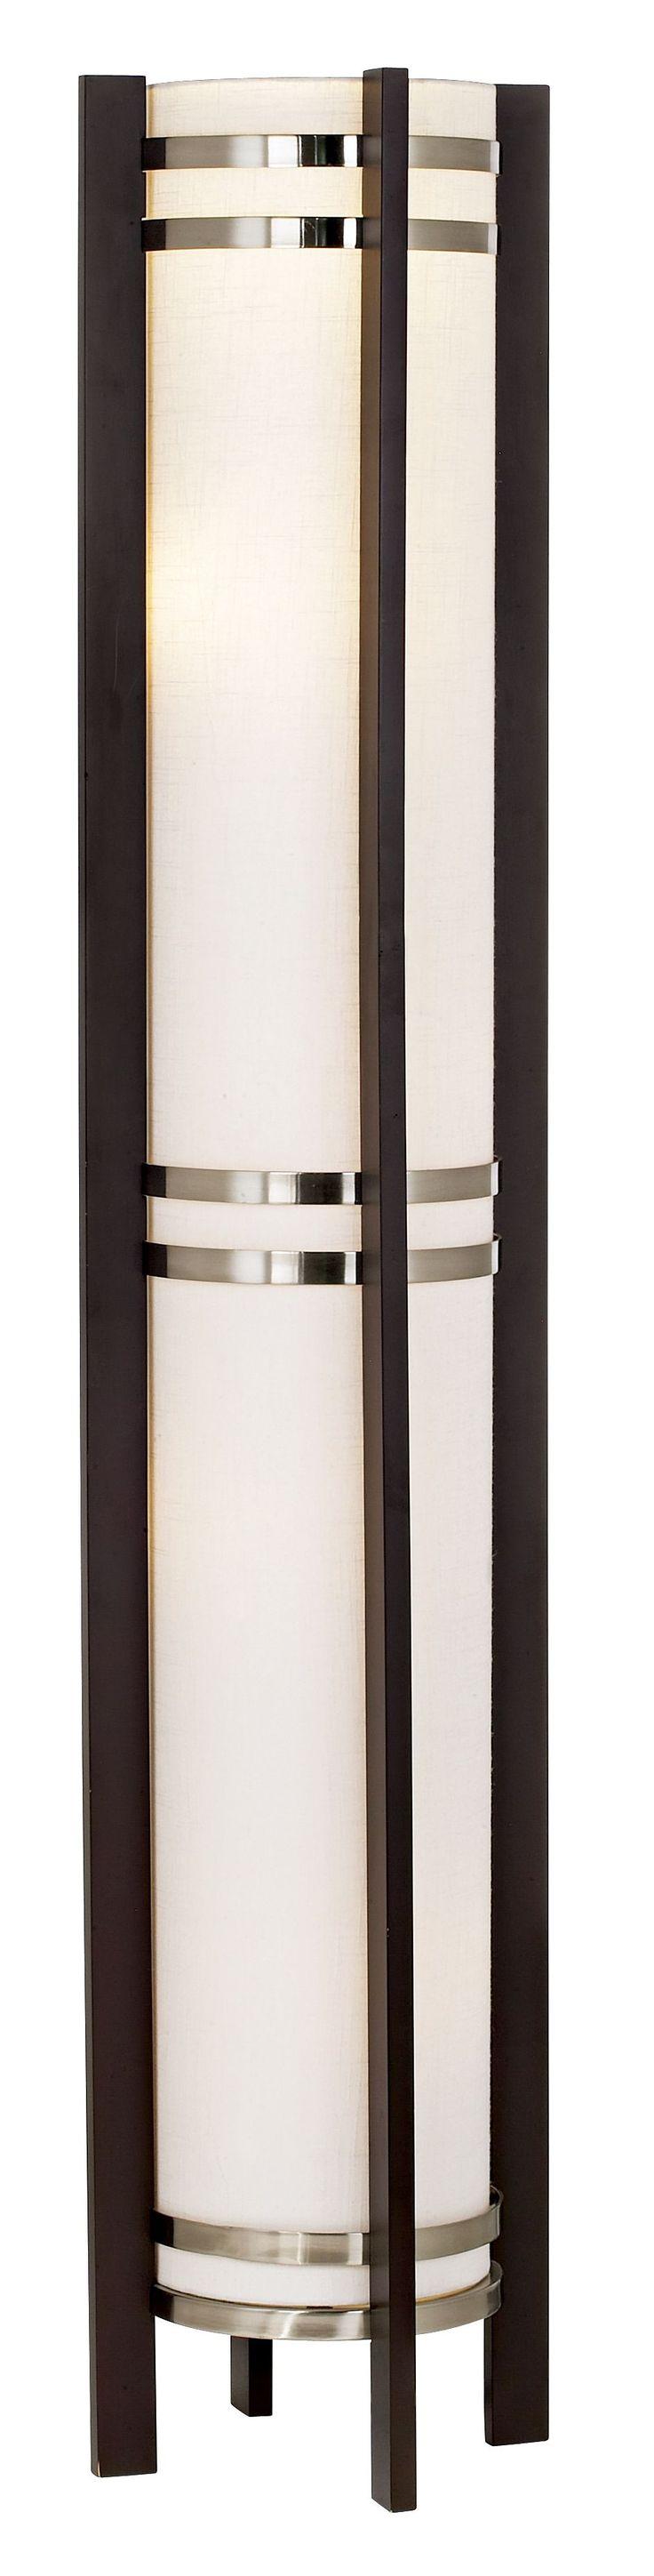 Threshold torchiere floor lamp textured bronze 65 - Possini Euro Chocolate Wood And Nickel Torchiere Floor Lamp Euro Style Lighting